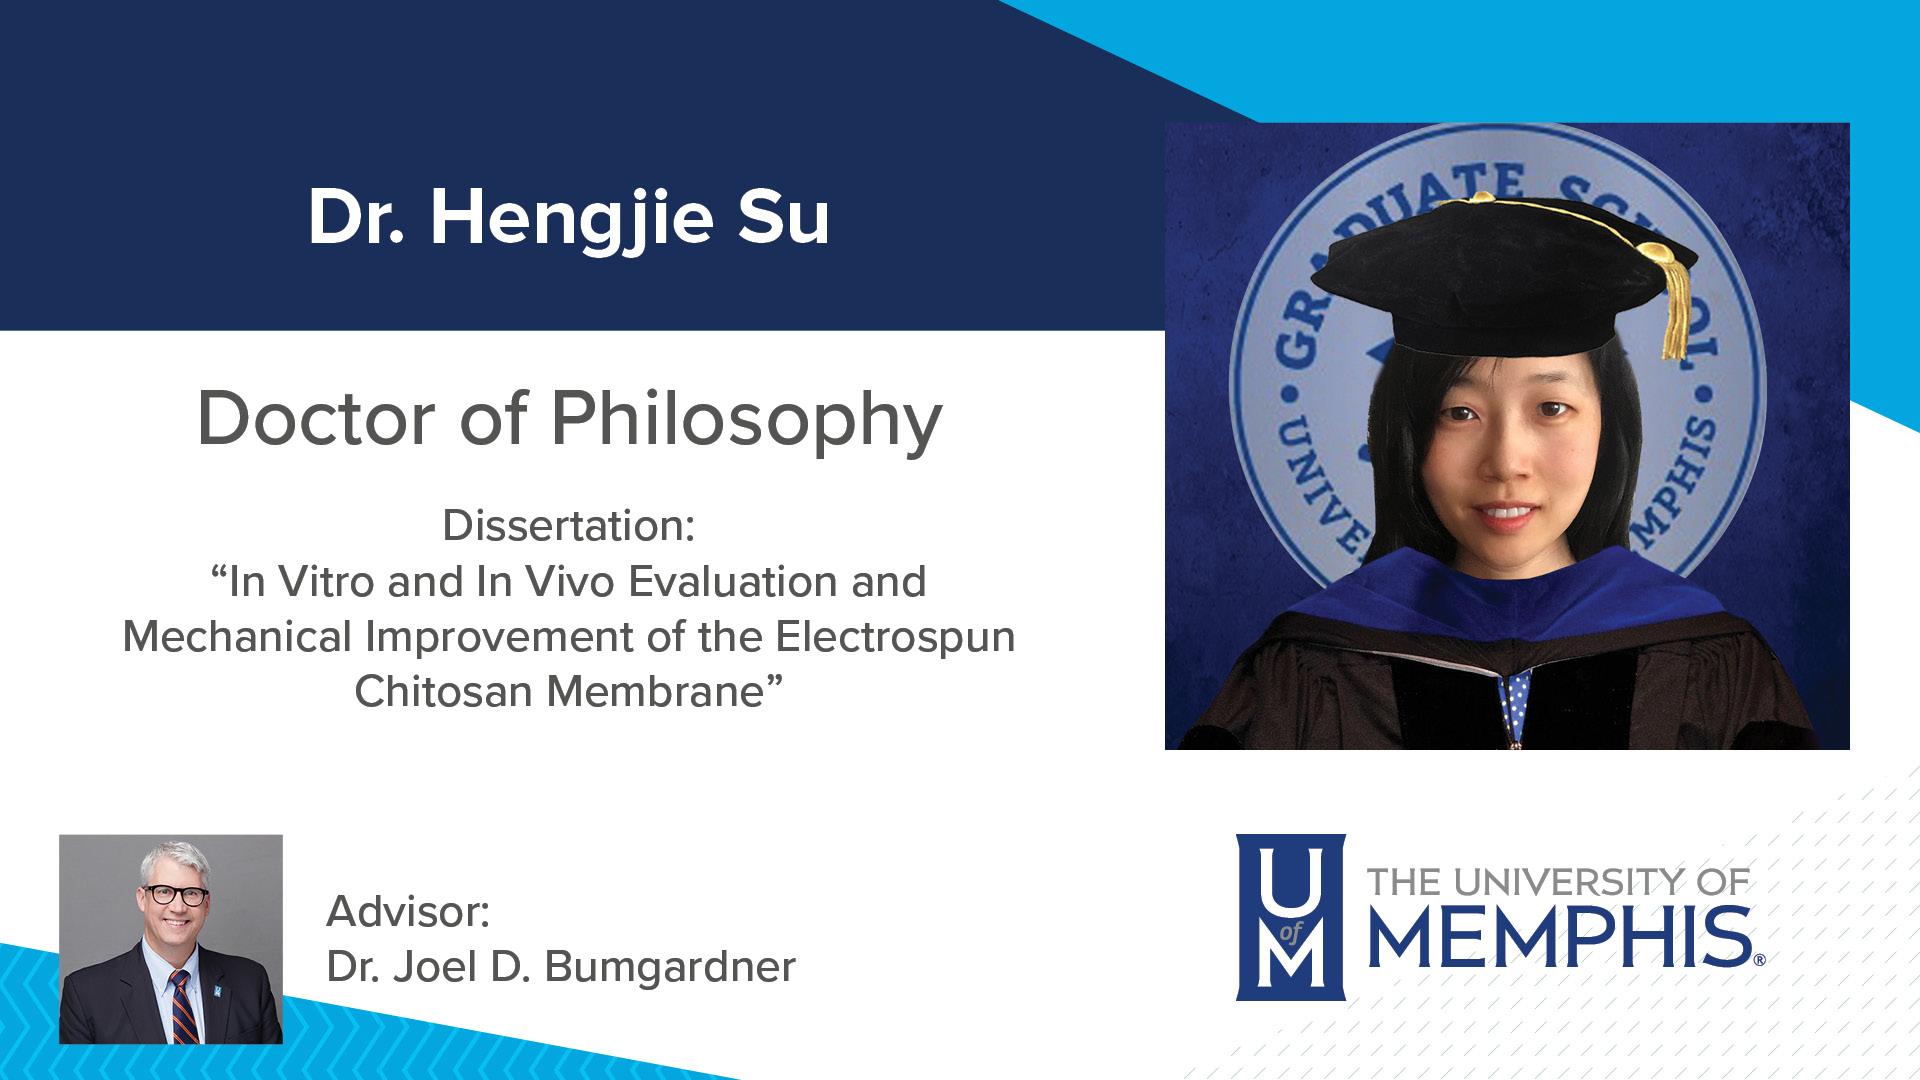 "Dr. Hengjie Su Dissertation: ""In Vitro and In Vivo Evaluation and Mechanical Improvement of the Electrospun Chitosan Membrane "" Major Professor: Dr. Joel D. Bumgardner"